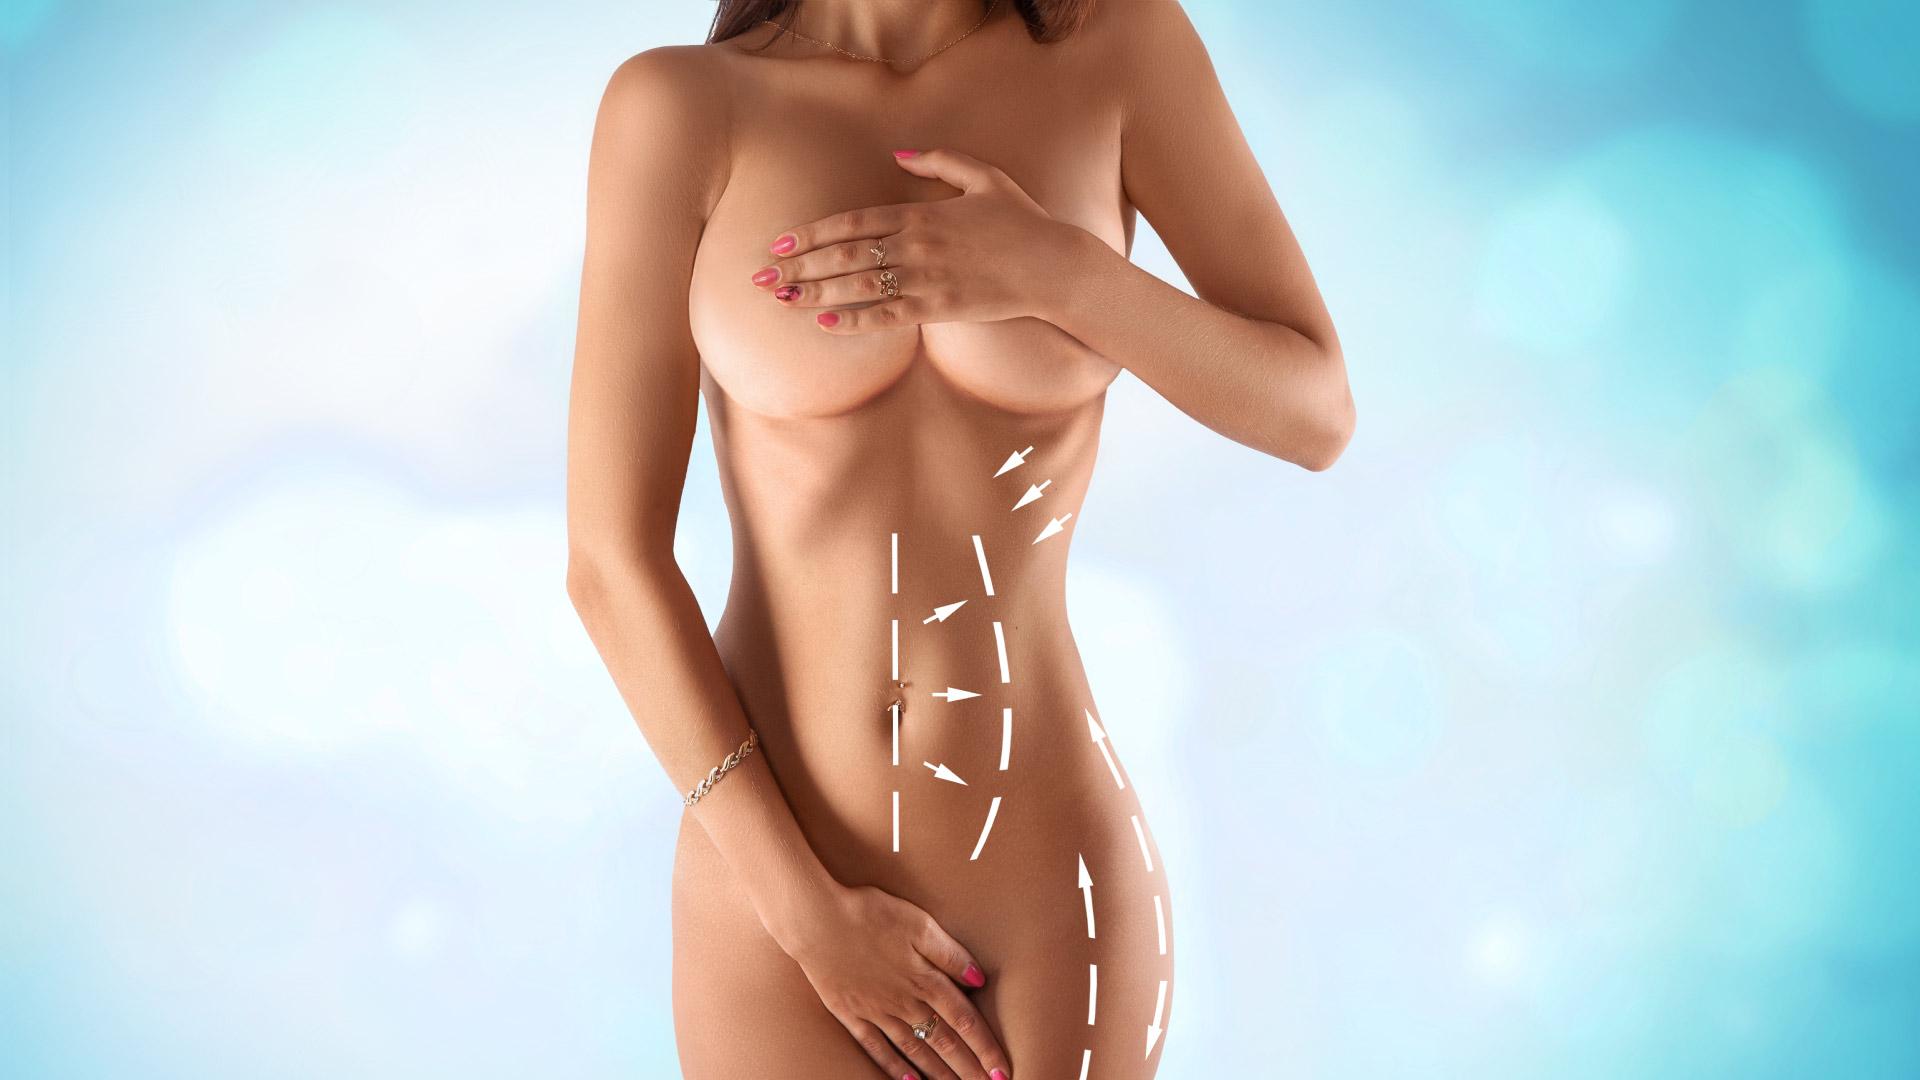 Body picture